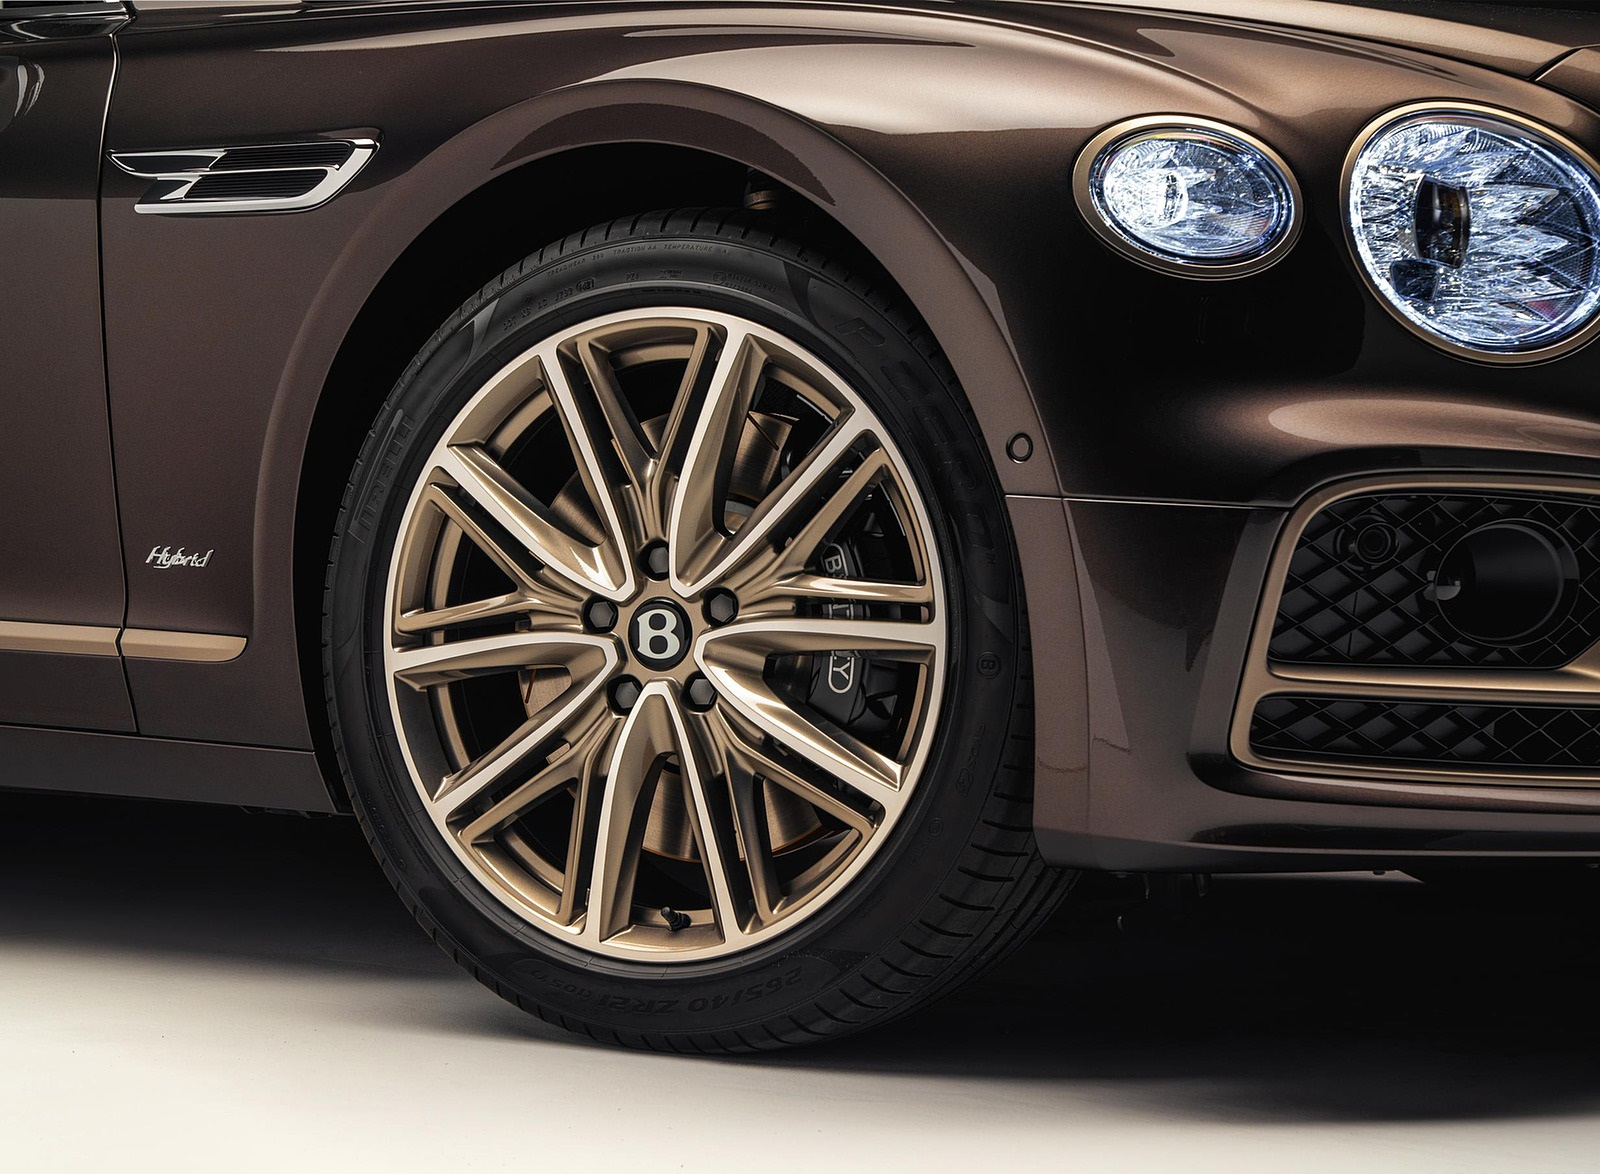 2022 Bentley Flying Spur Hybrid Odyssean Edition Wheel Wallpapers (4)